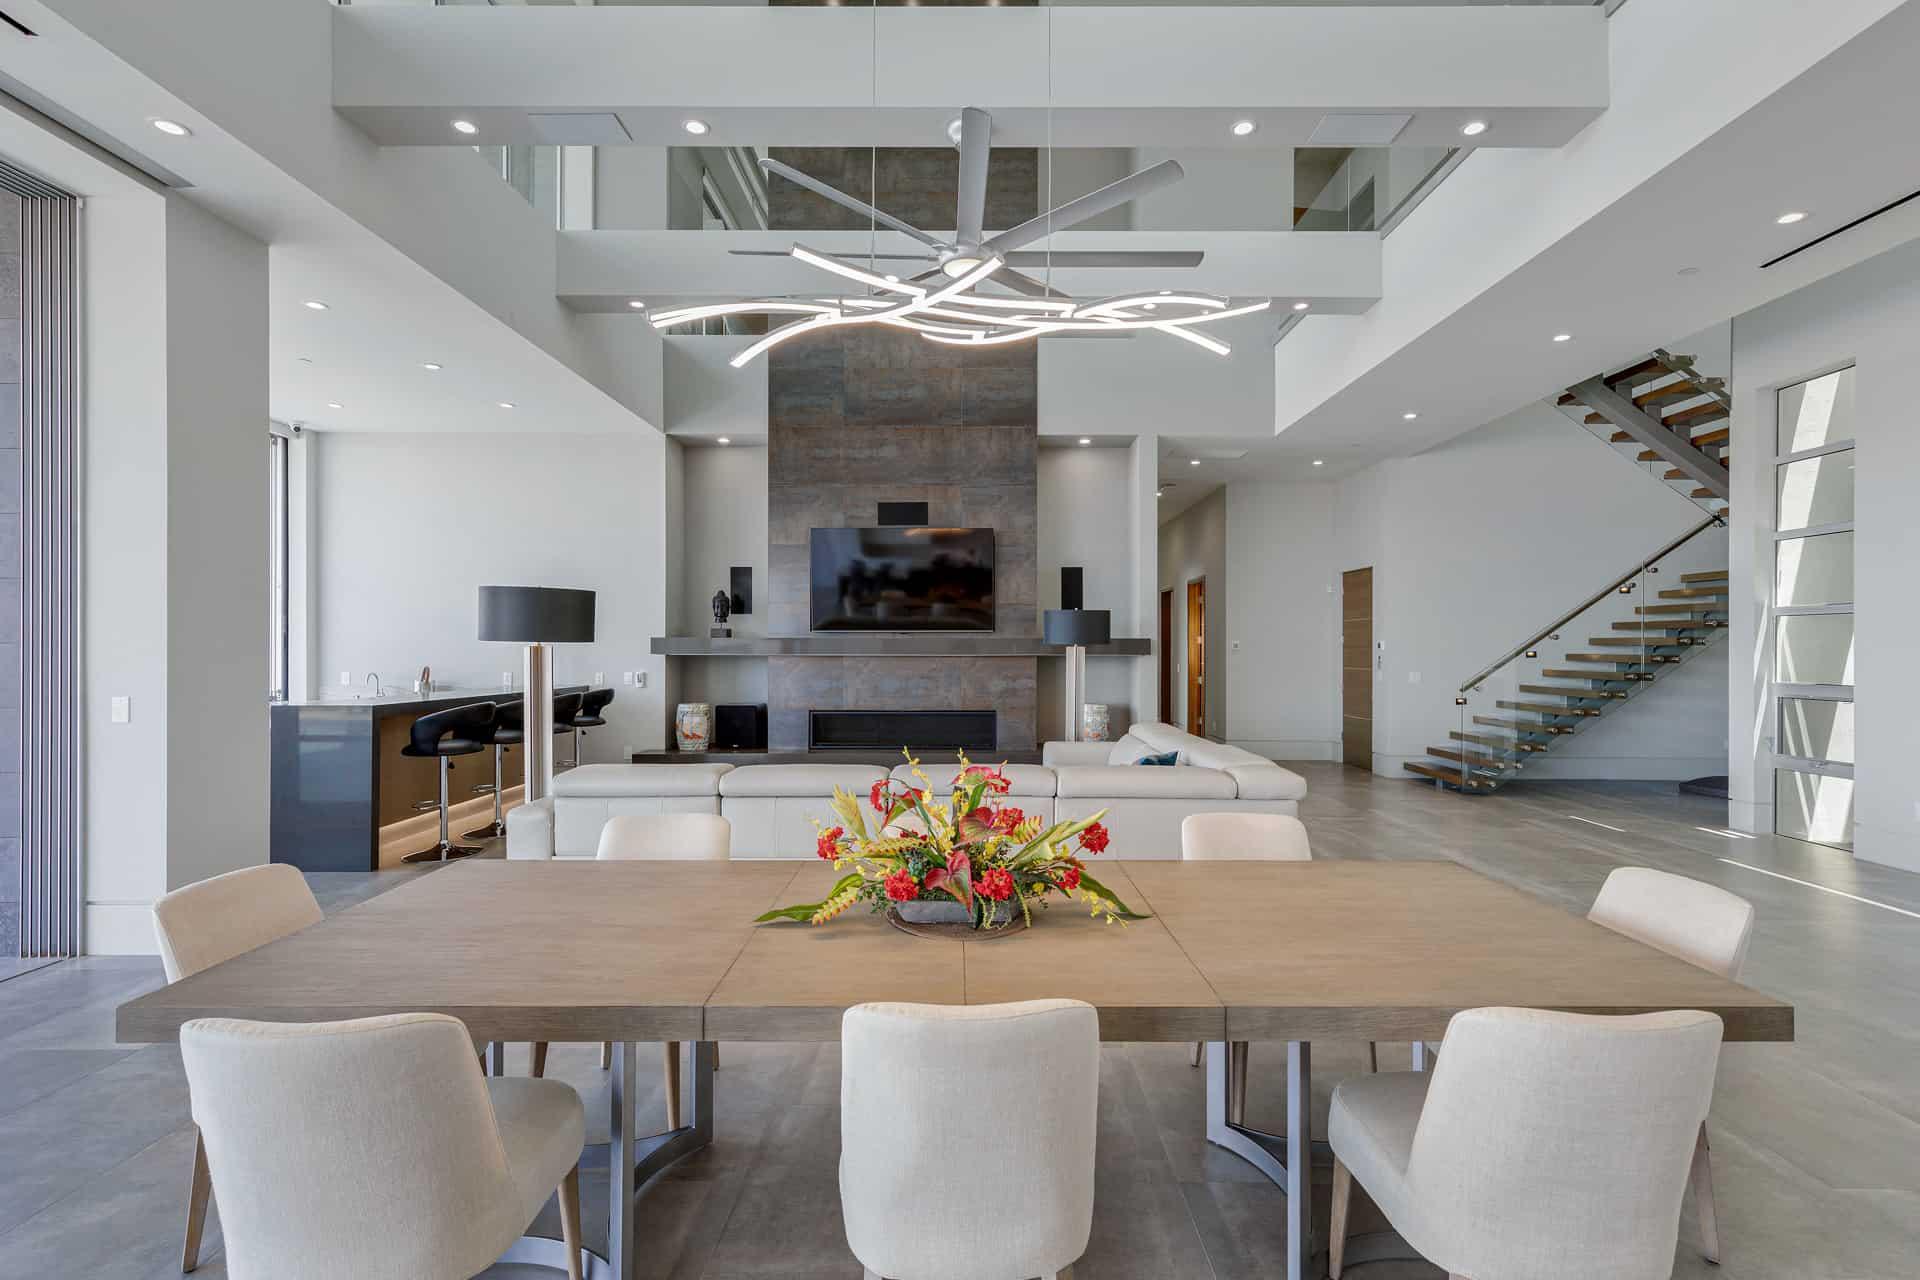 las-vegas-luxry-real-estate-realtor-rob-jensen-company-5-rockstream-drive-ascaya028